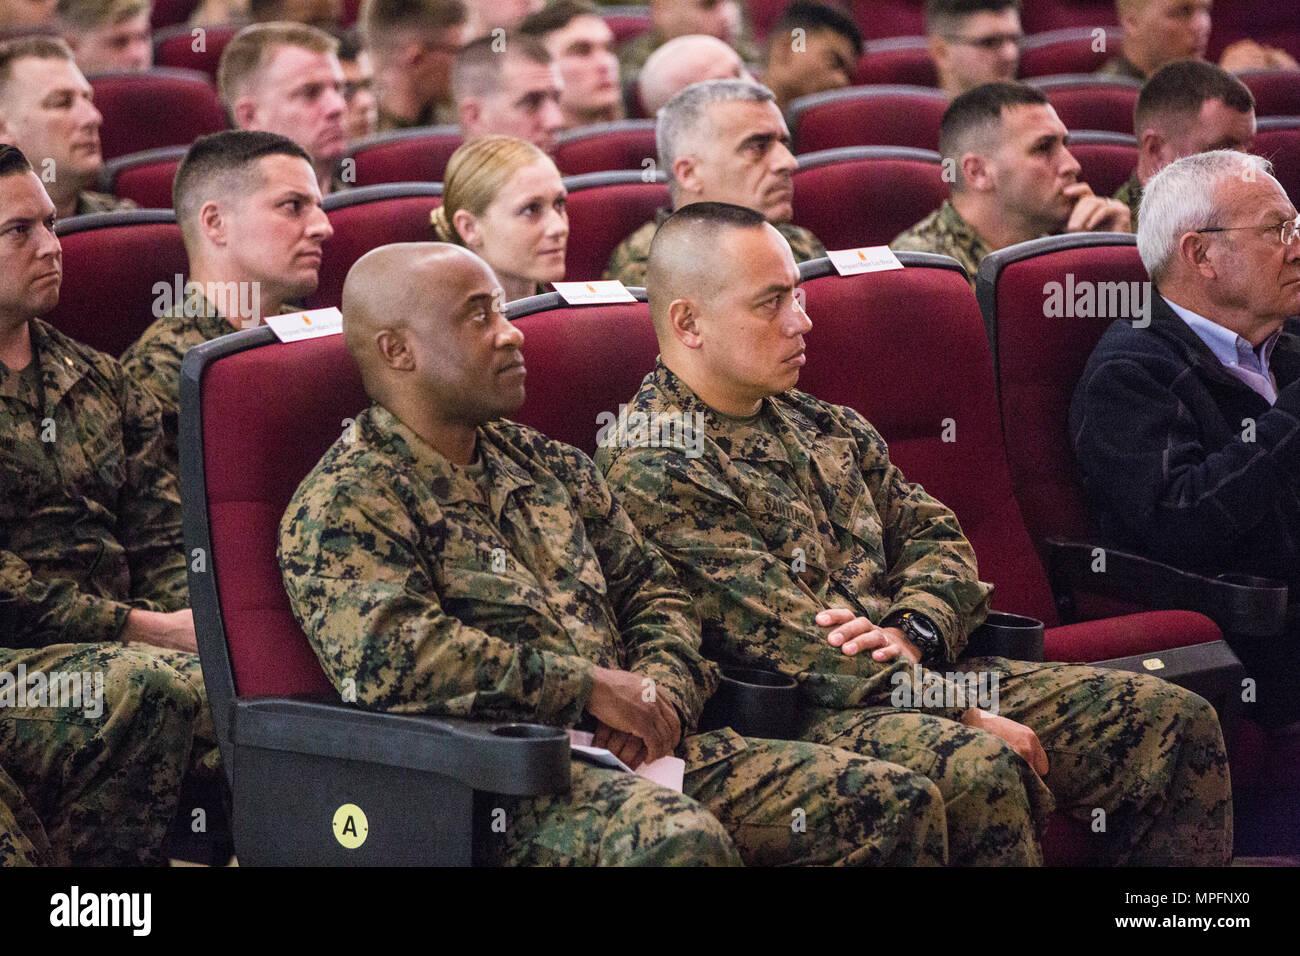 Us marines dating